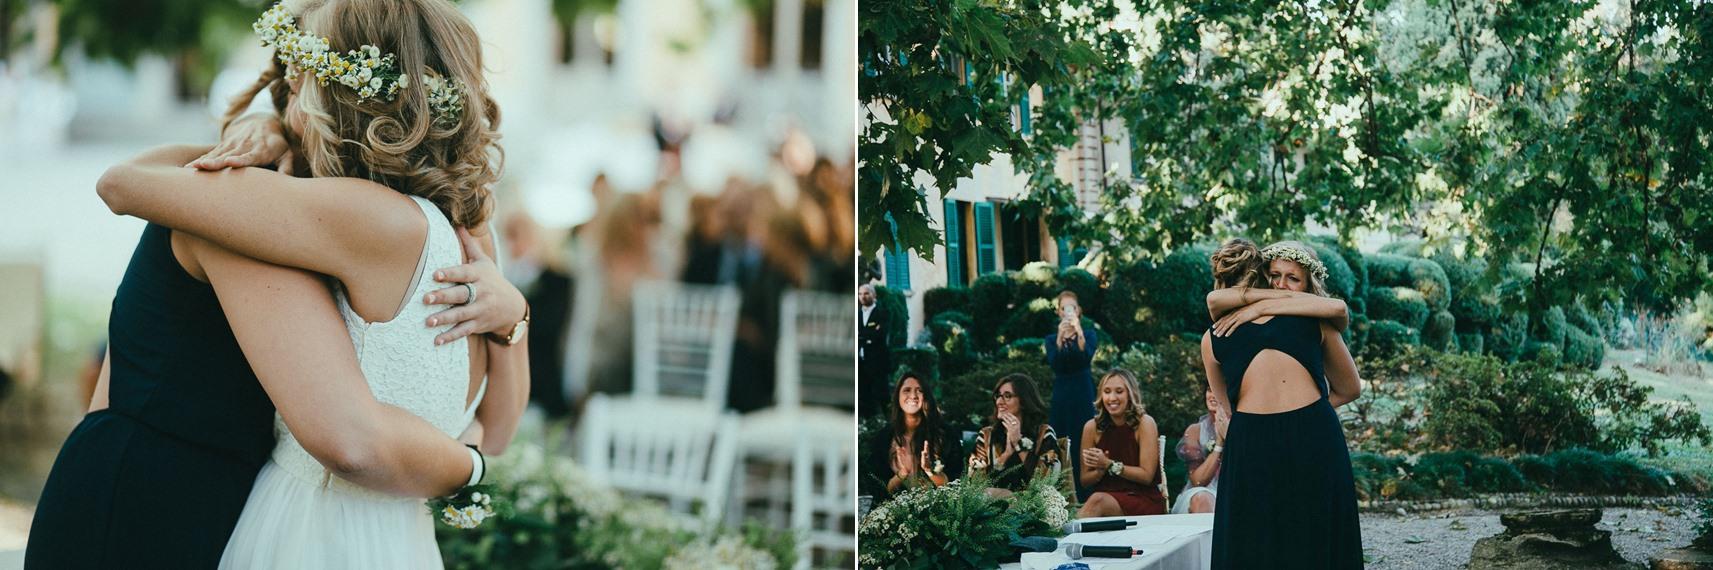 wedding-in-italy (53).jpg